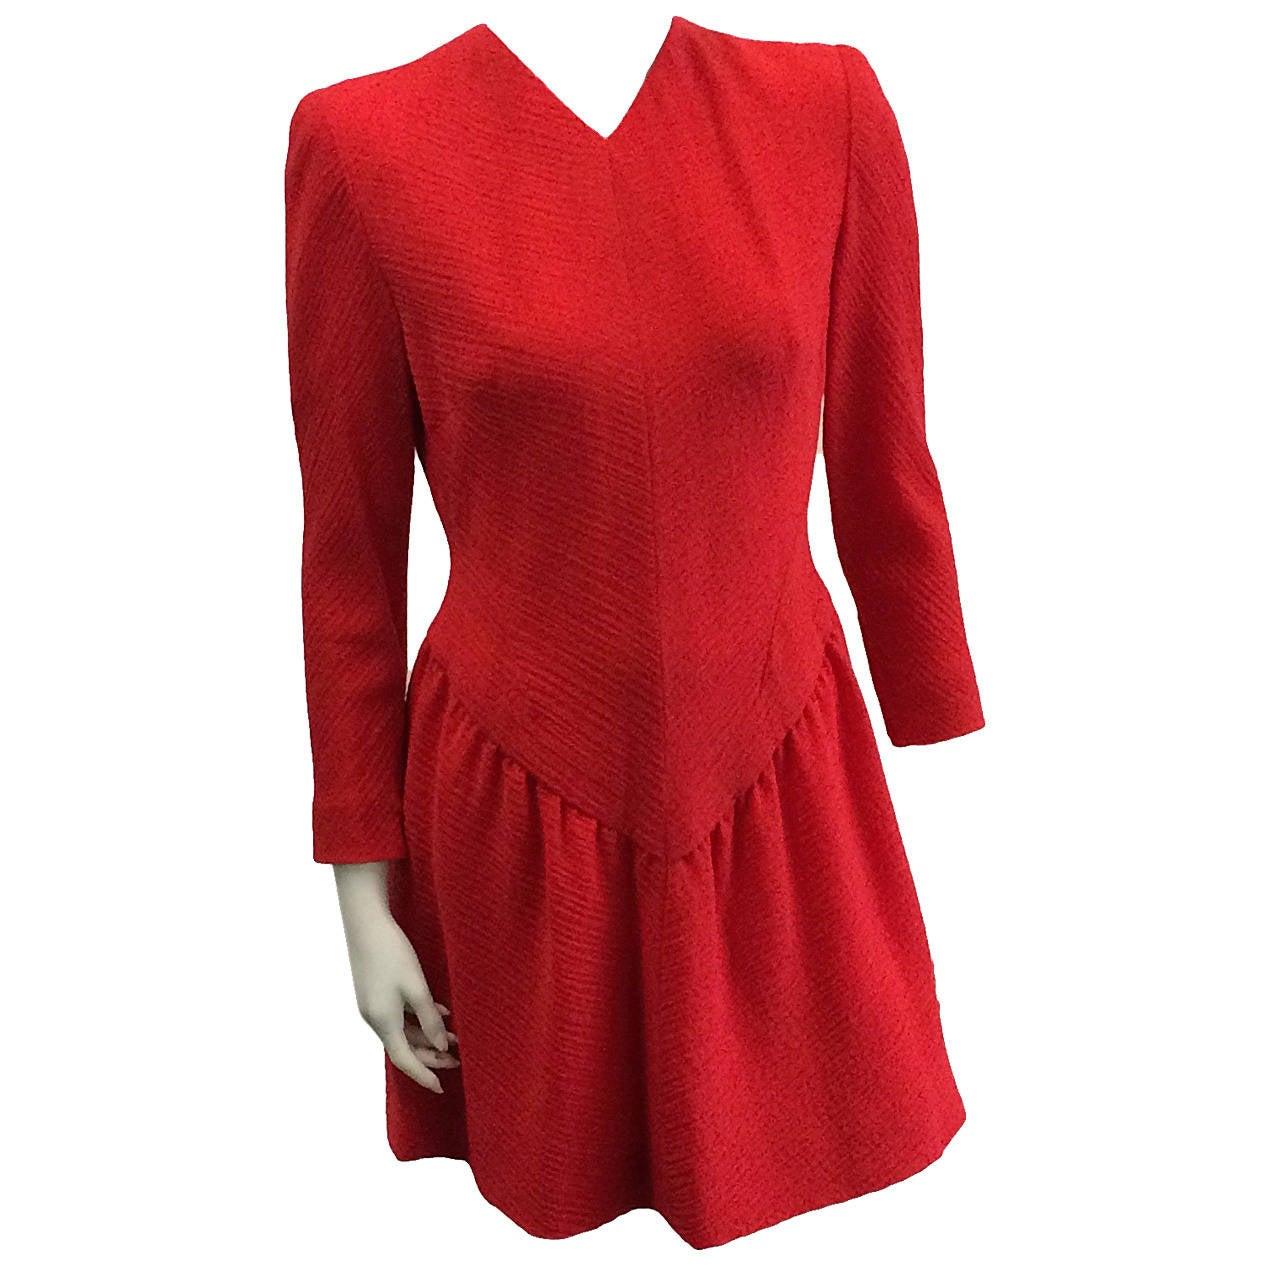 Pauline Trigere Wool Dress, 1980s